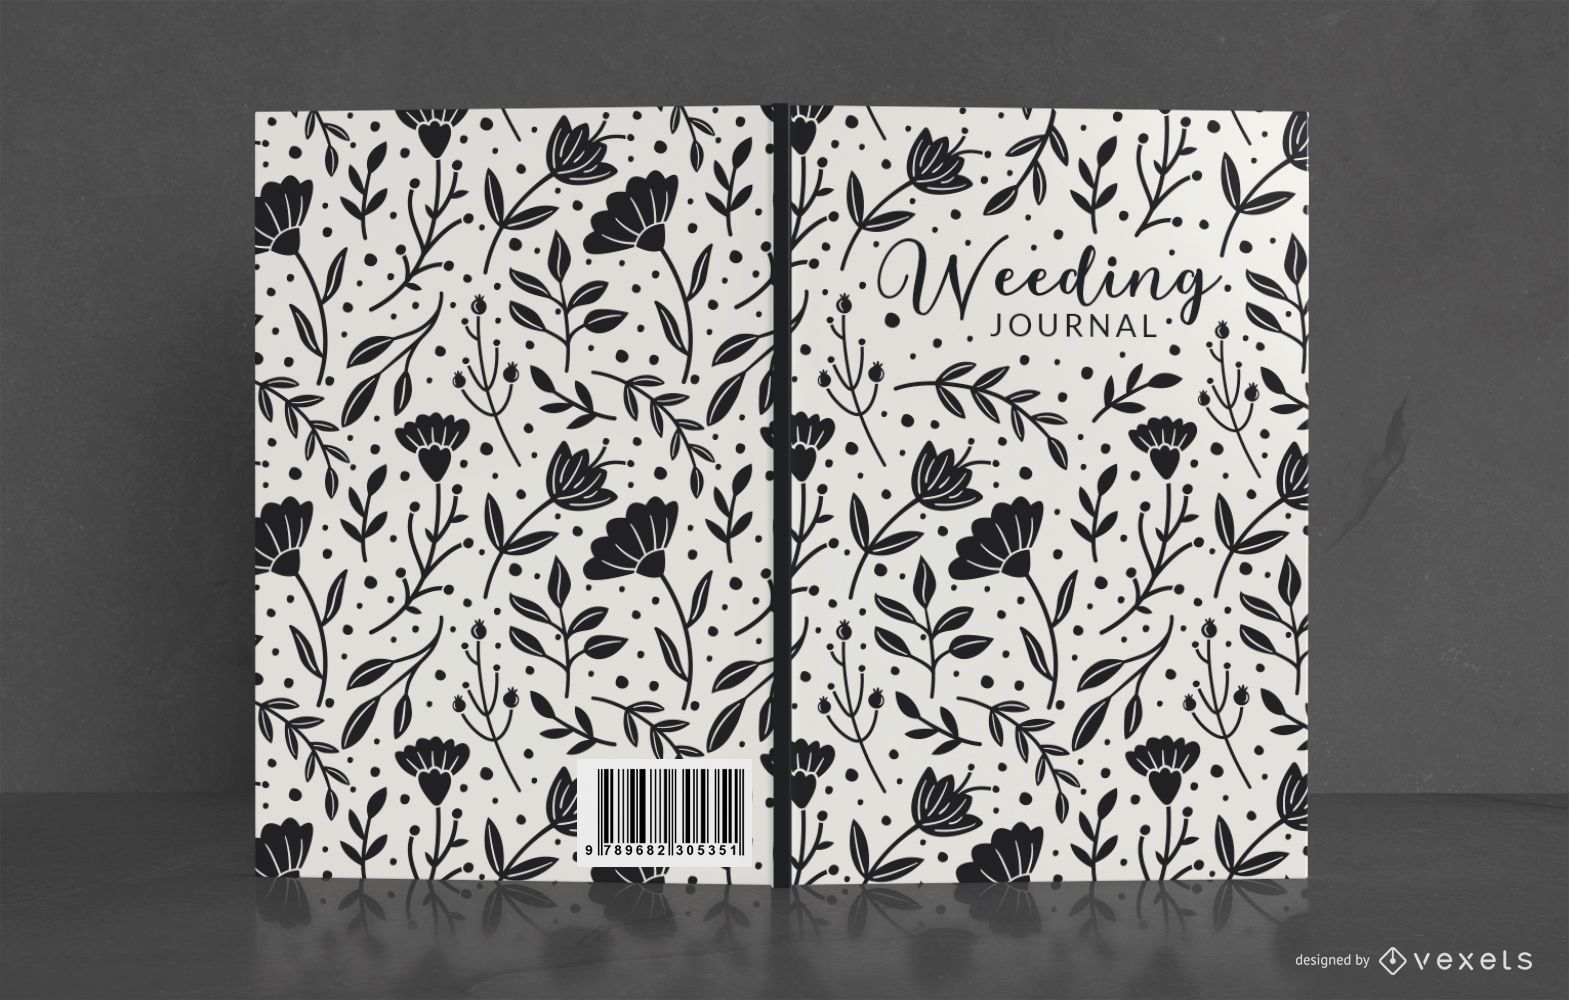 Floral wedding journal book cover design